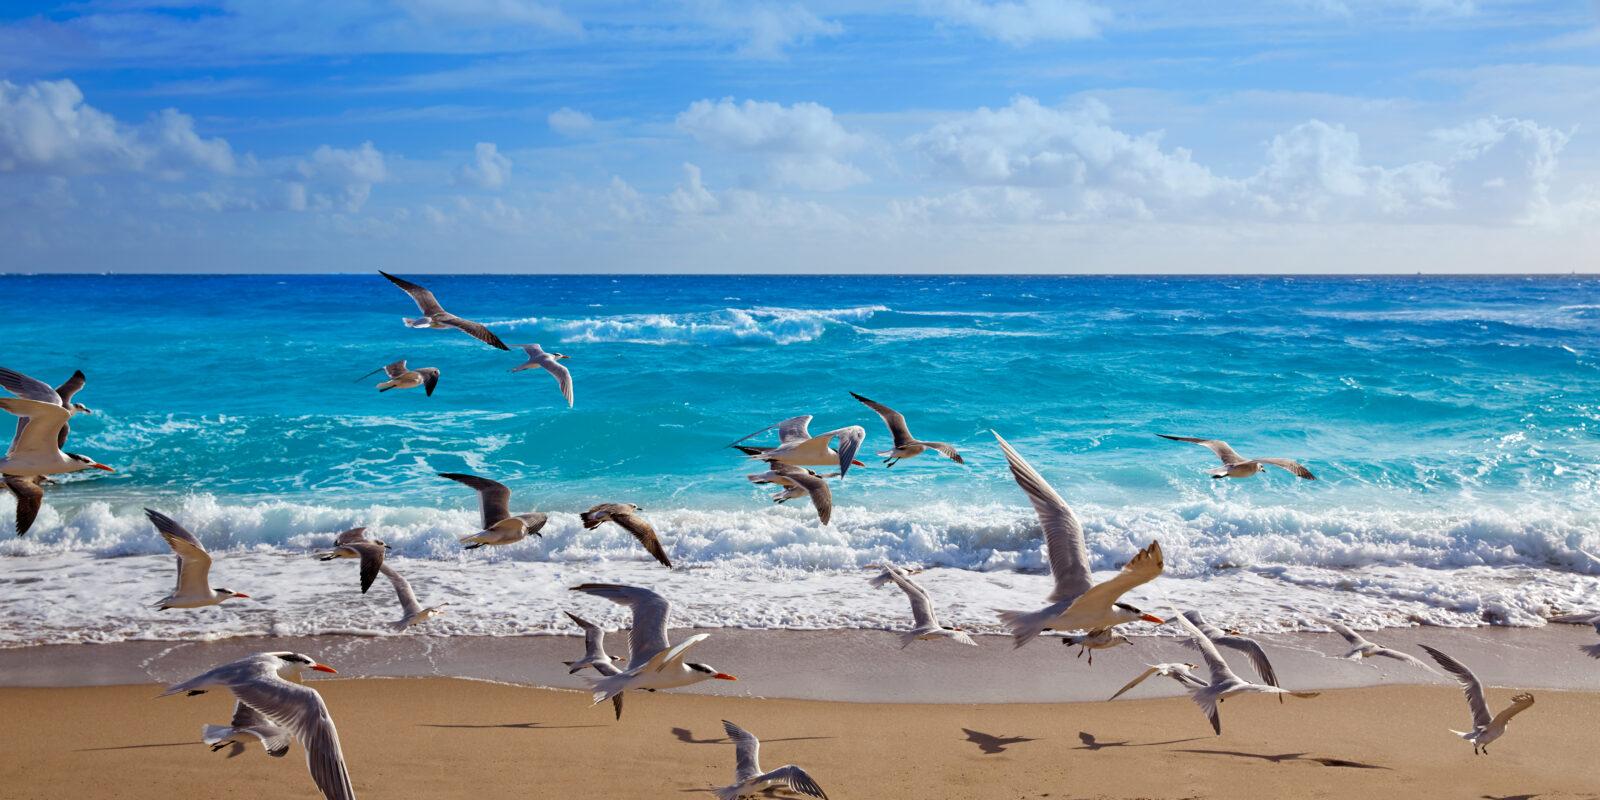 Seagulls fly across the beach at Singer Island